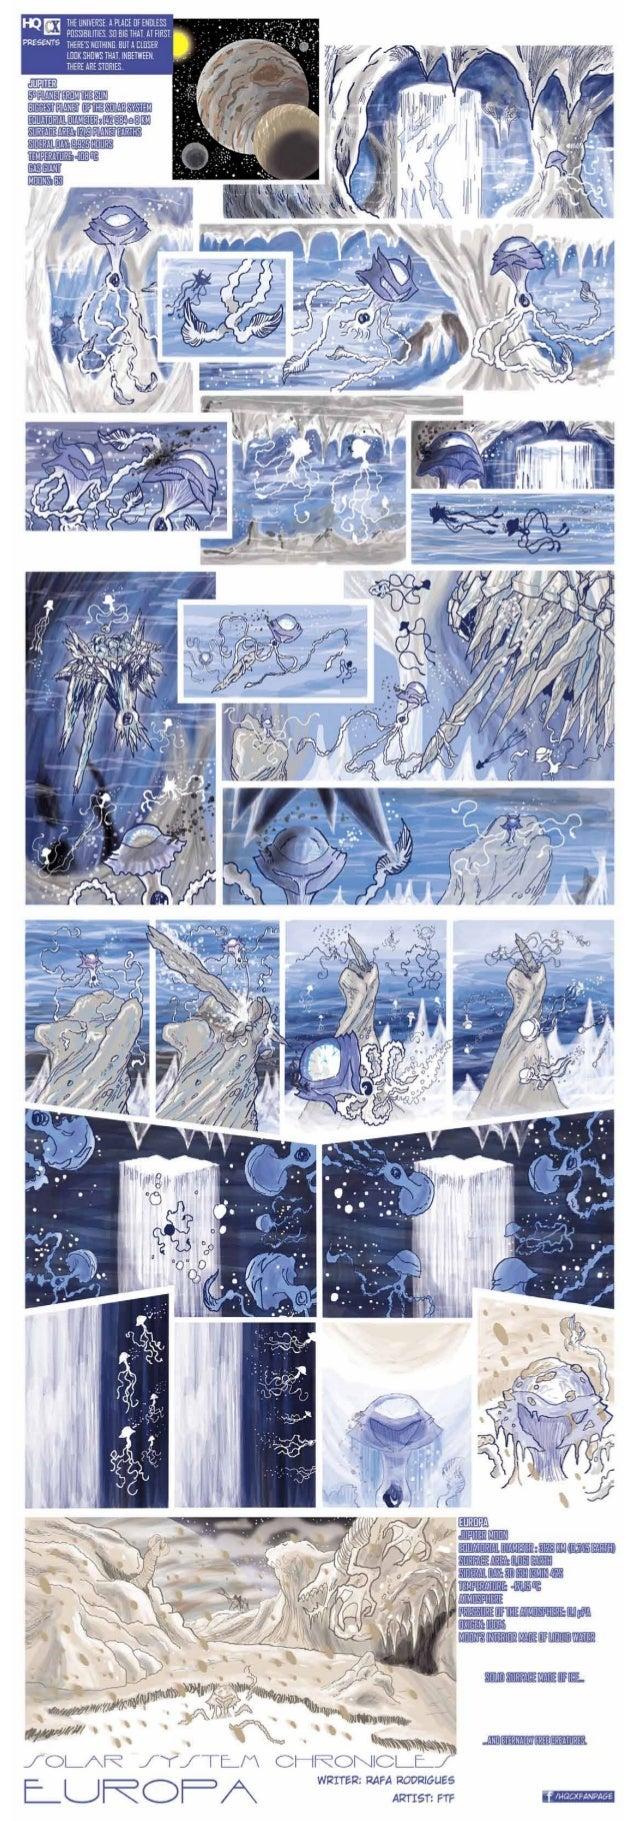 Solar System Chronicles: Europa